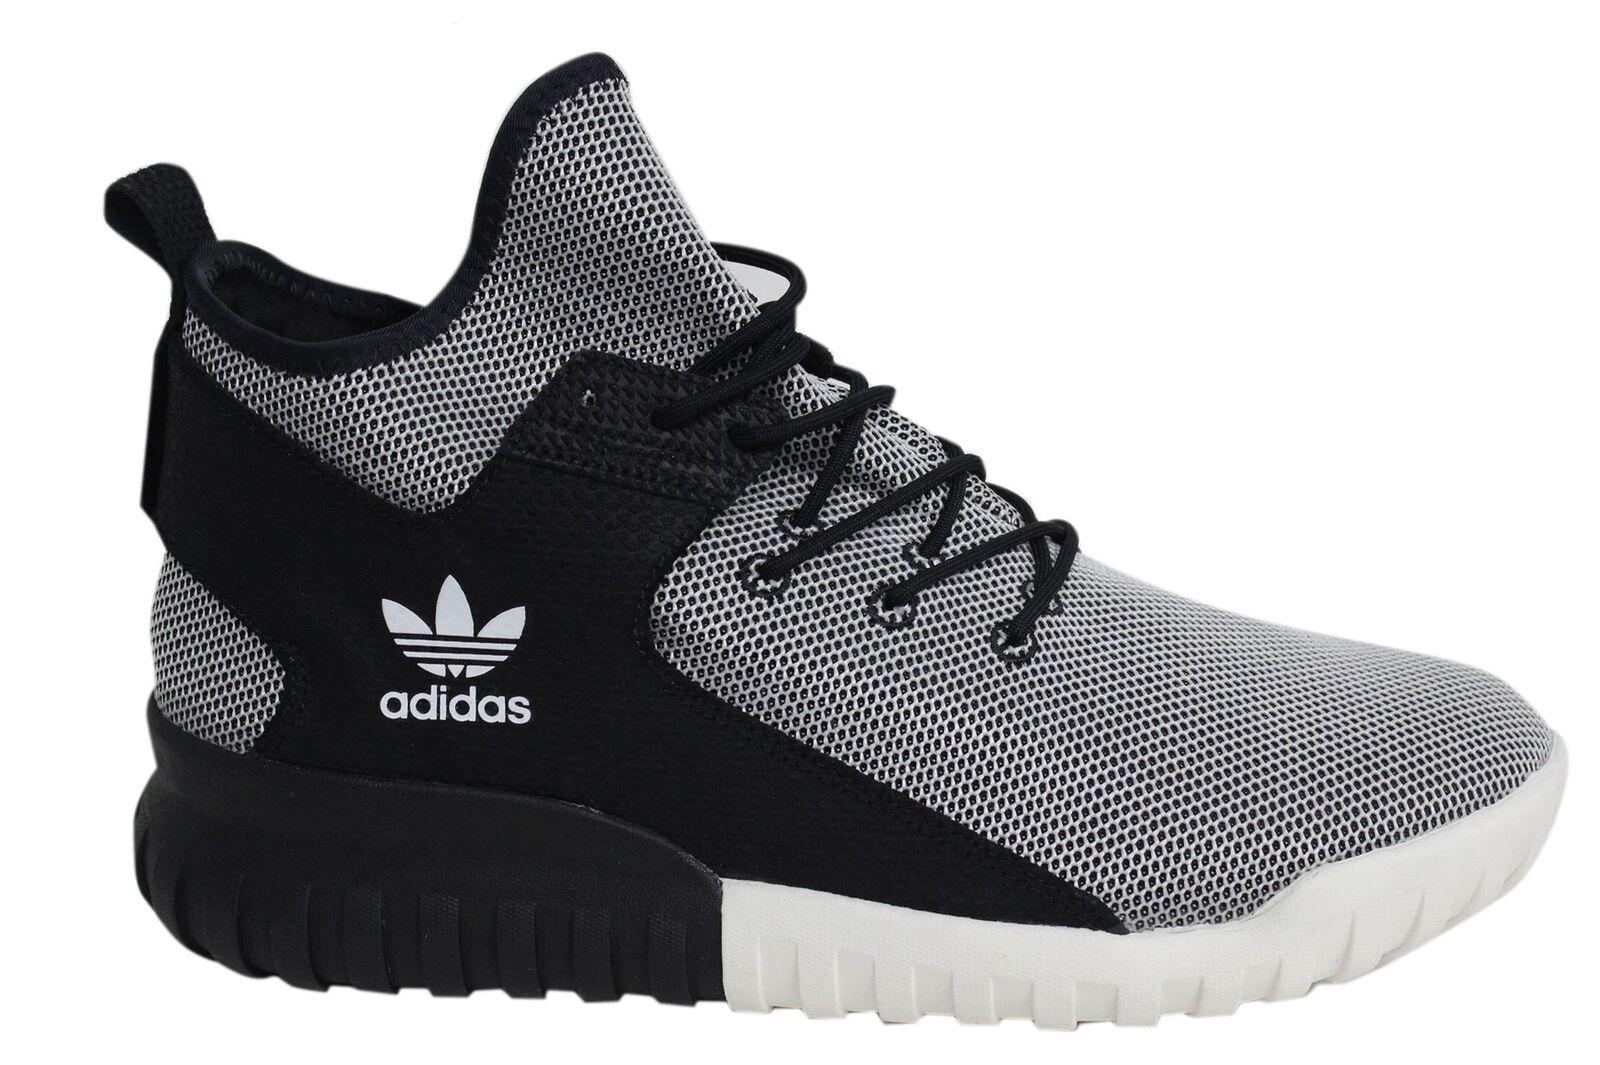 Adidas Tubular X Lace Up Black White Mens Textile Hi Trainers BA7782 D49